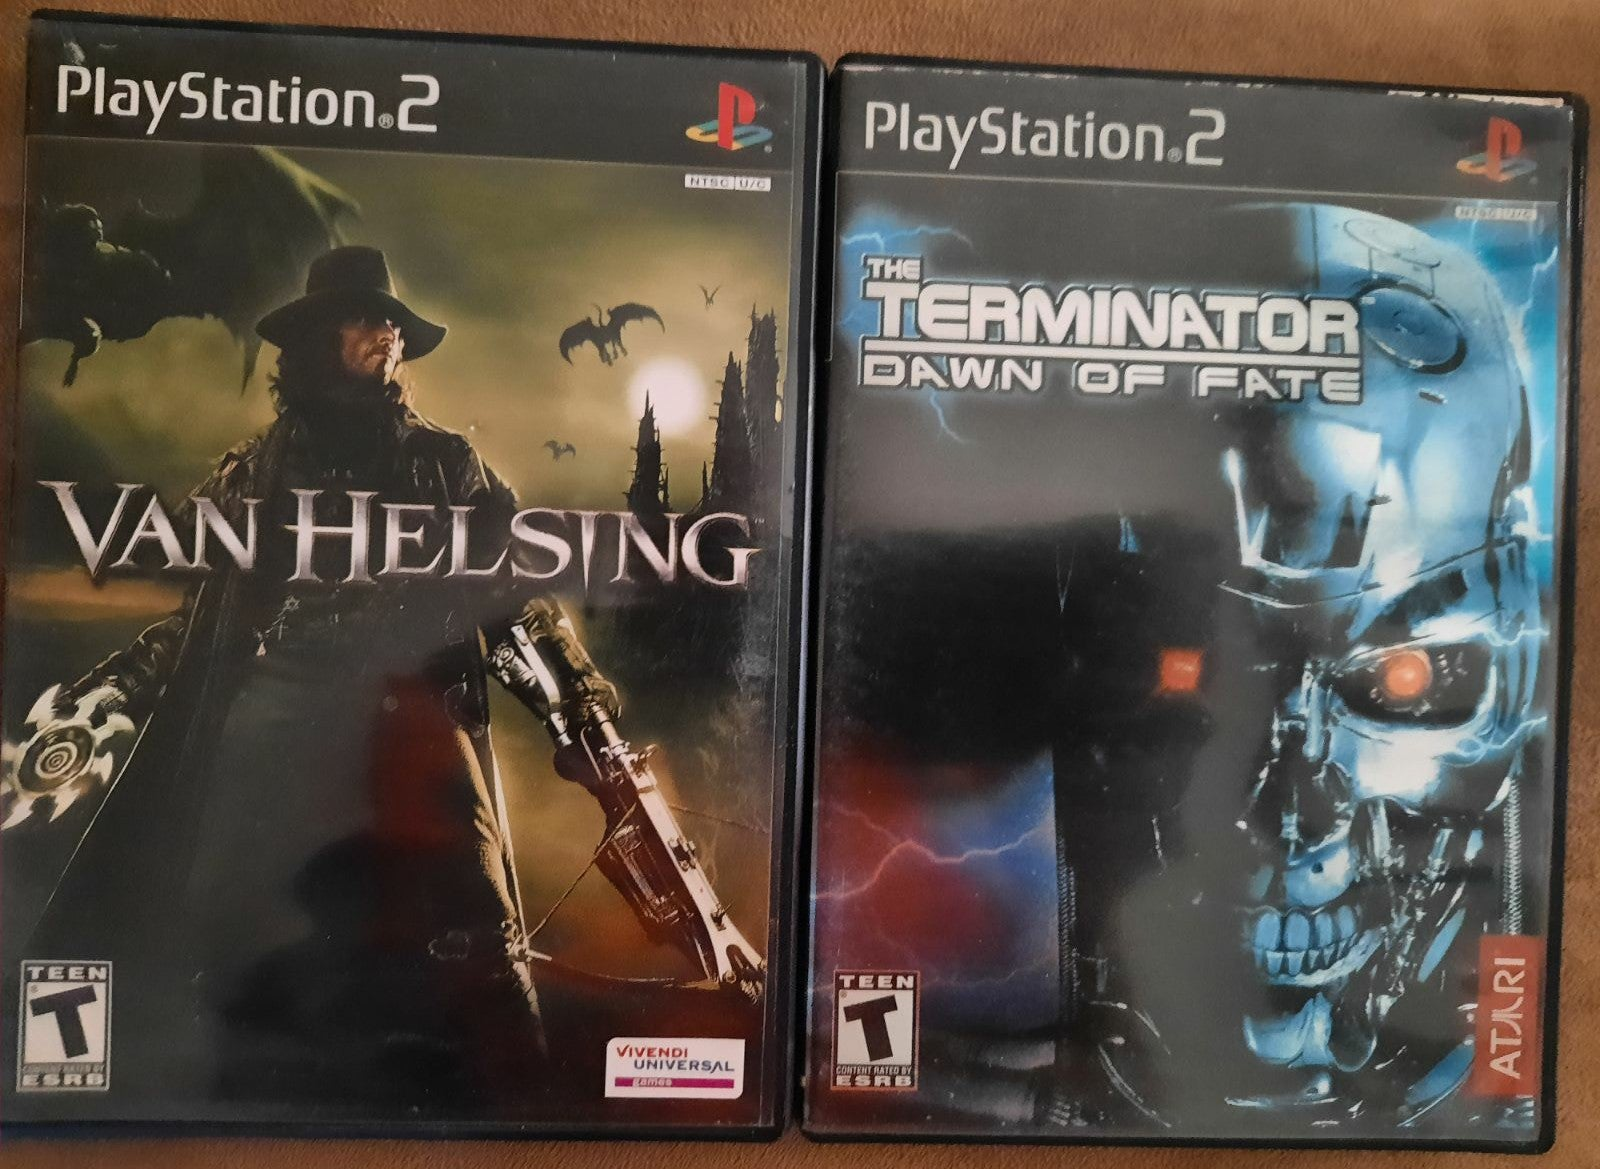 Van Helsing on Playstation 2 and Termina